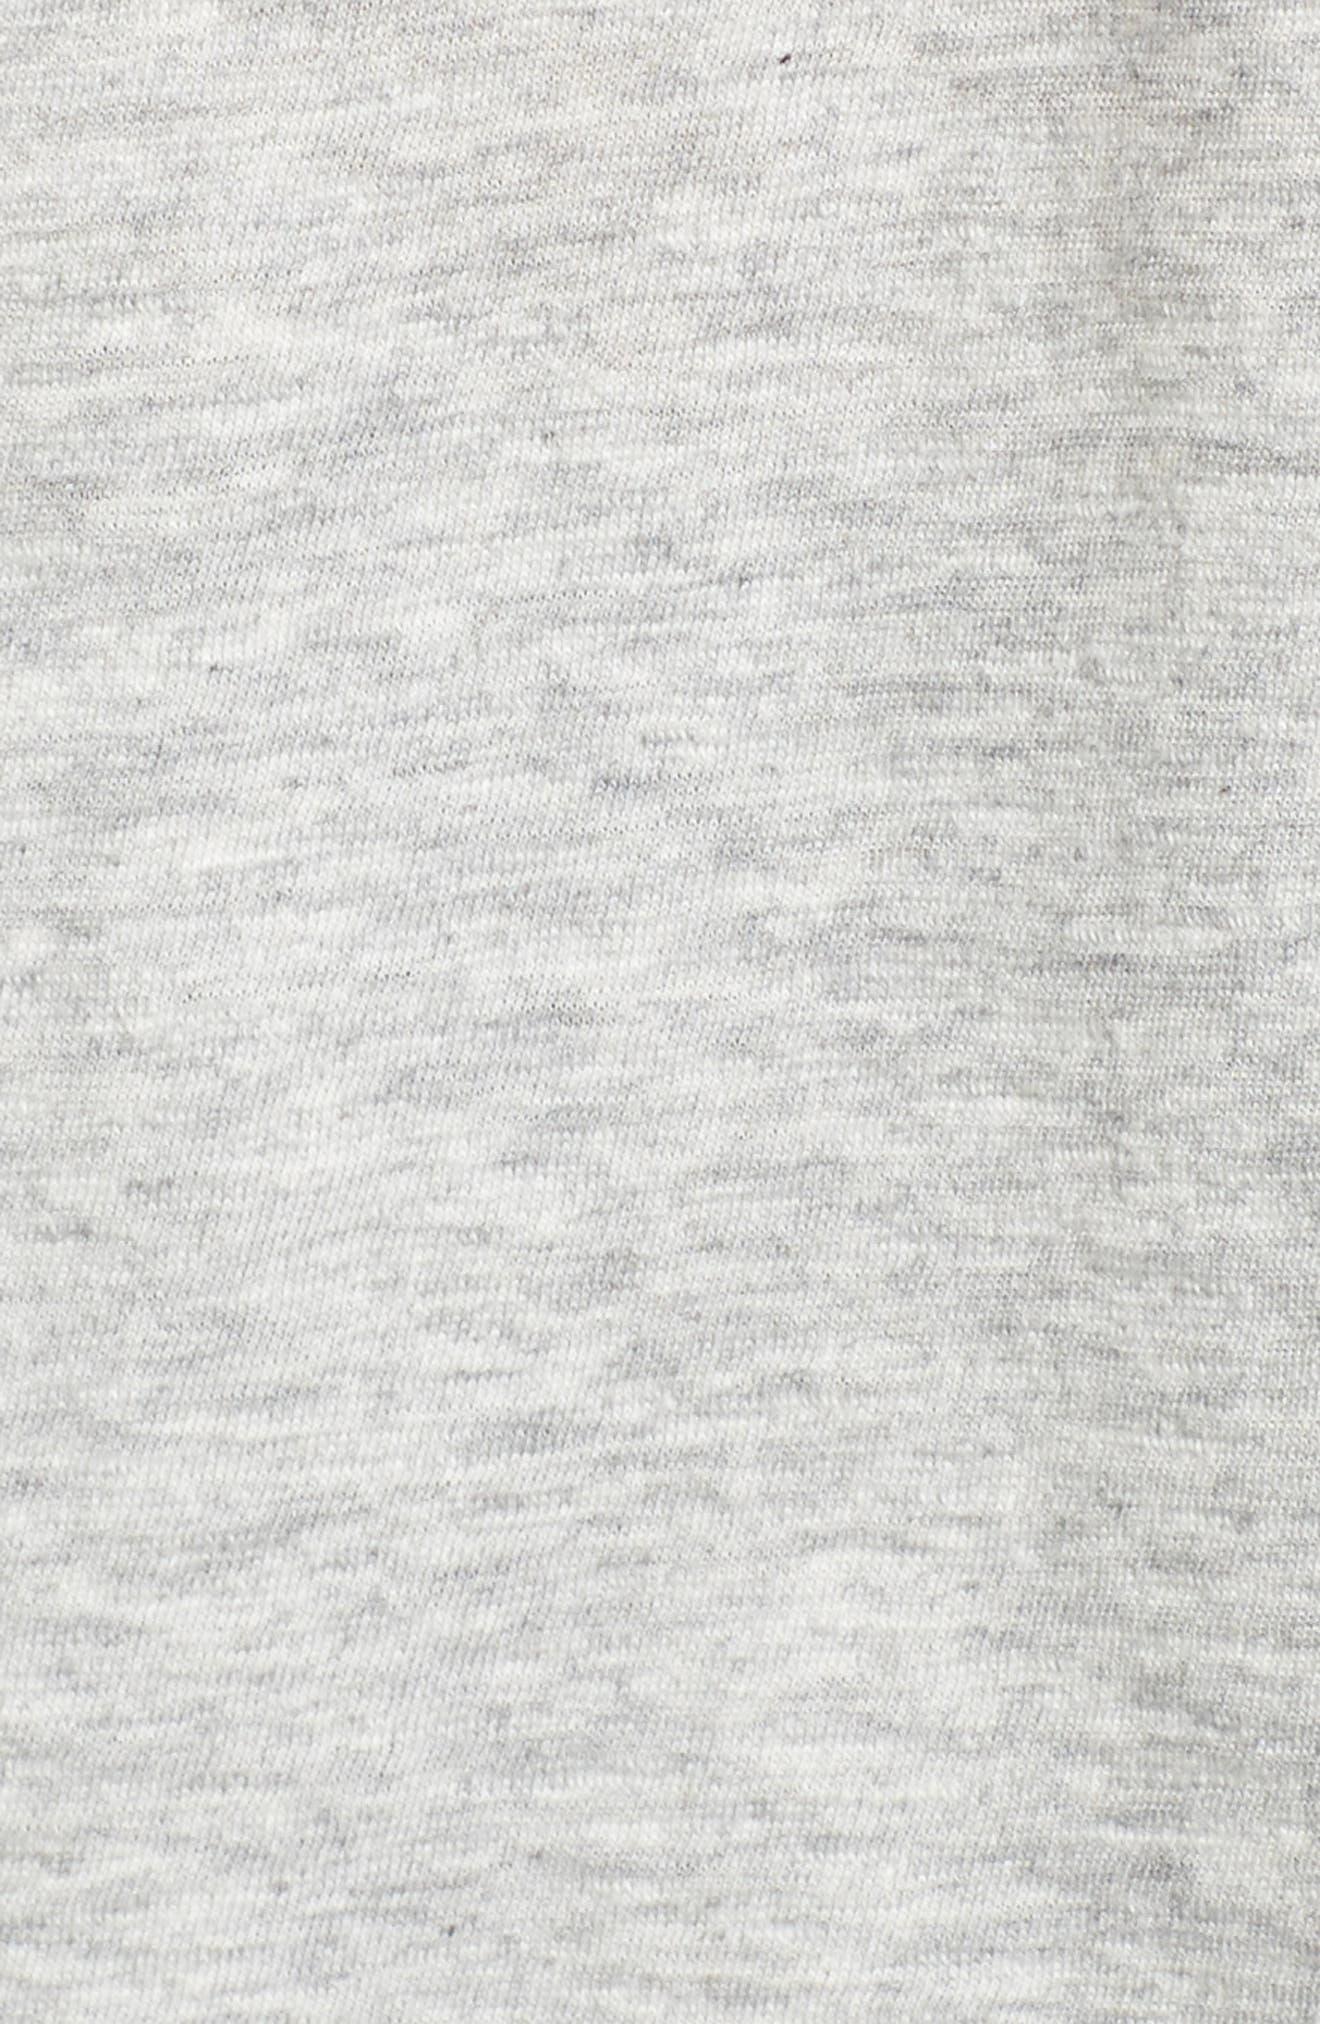 Long Sleeve Slub Whale Hoodie,                             Alternate thumbnail 5, color,                             063